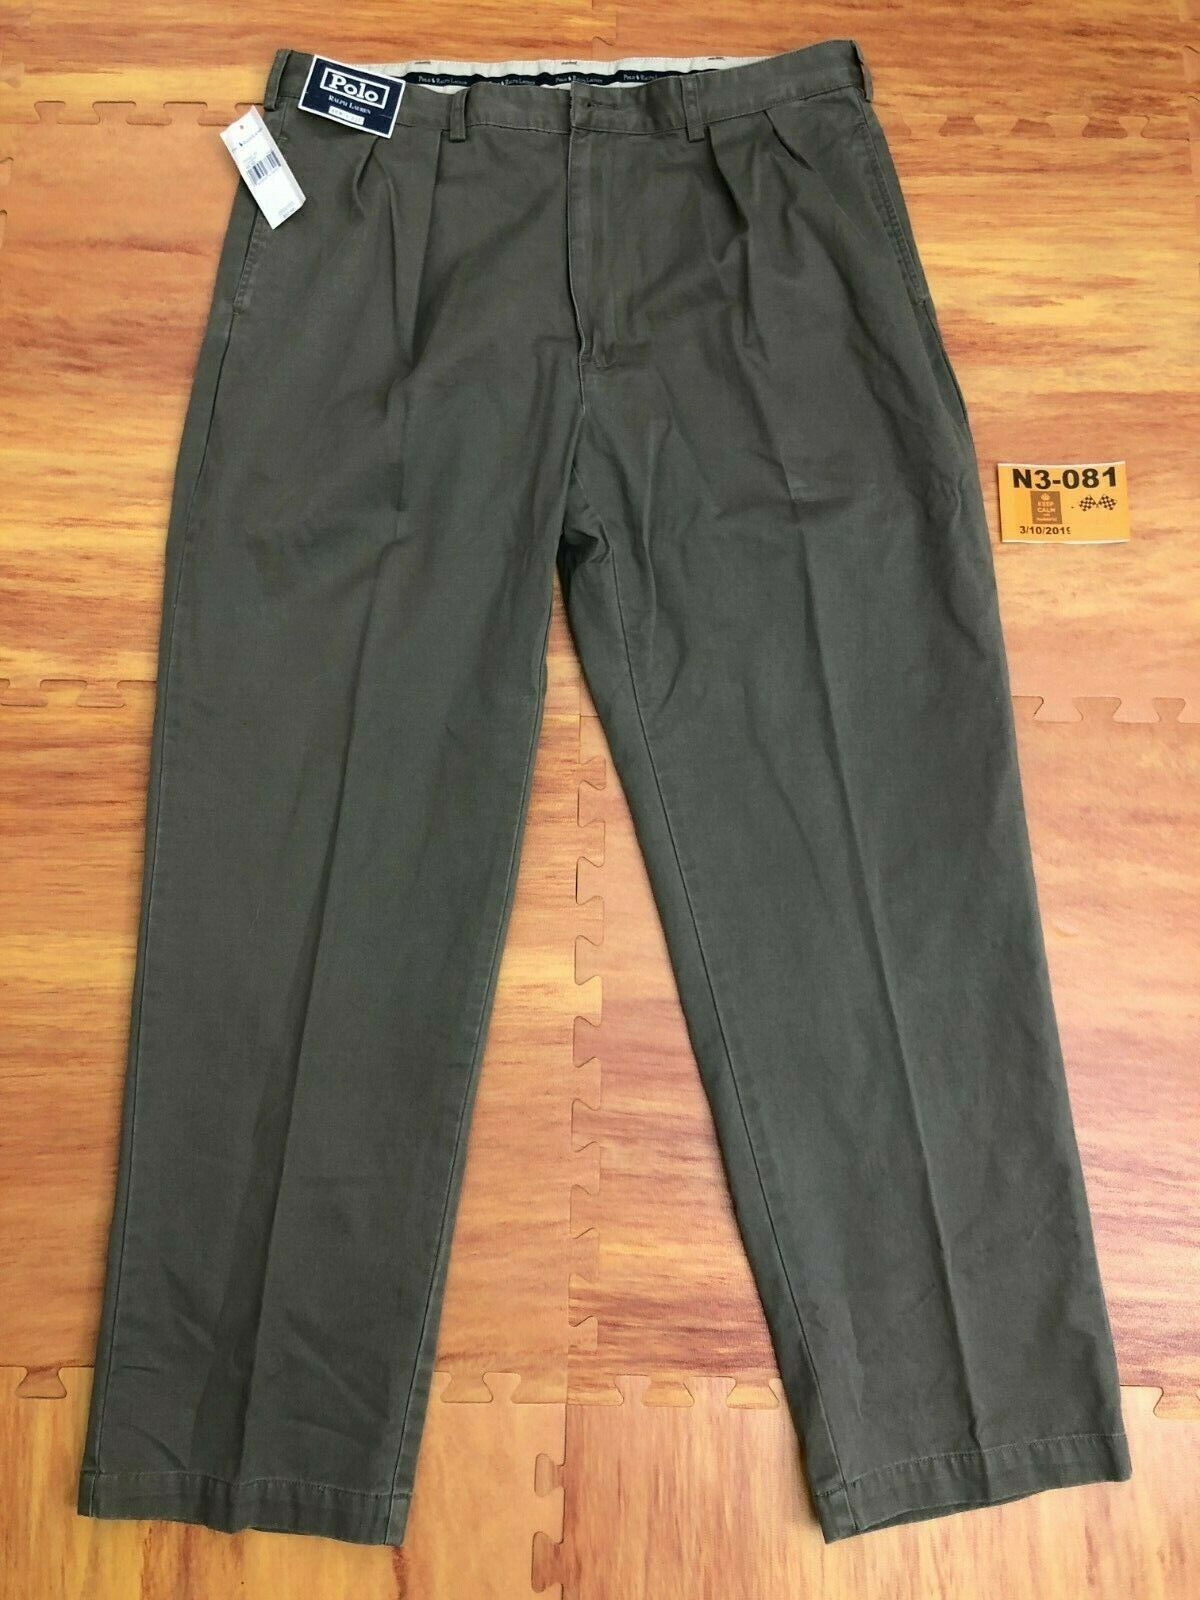 NEW Vintage Polo Ralph Lauren Men's Classic Pleated Green Pant 40x32 7826322 ️N3